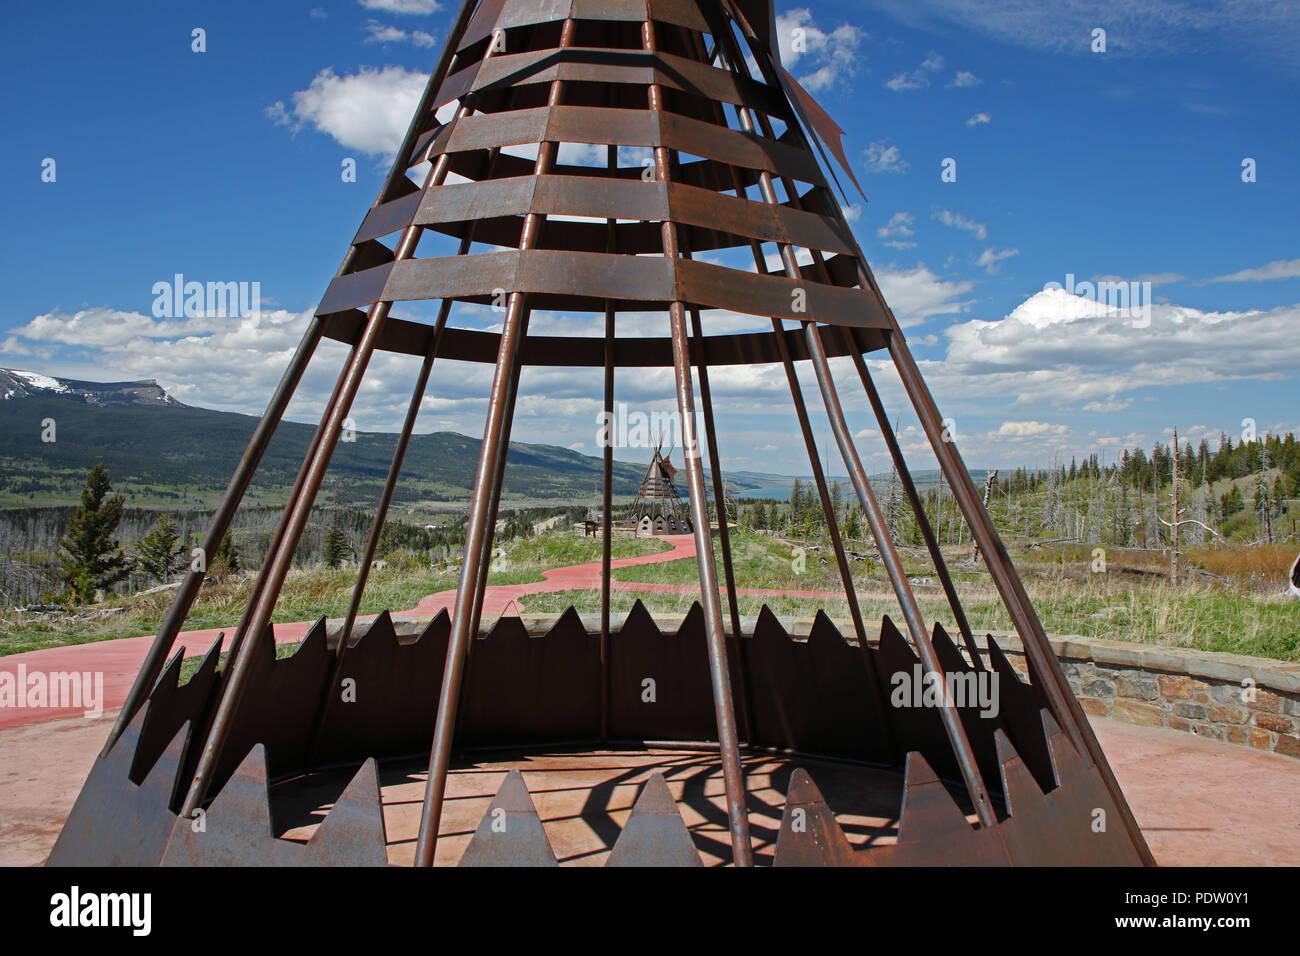 Blackfeet Indian Reservation. Montana, U.S.A - Stock Image